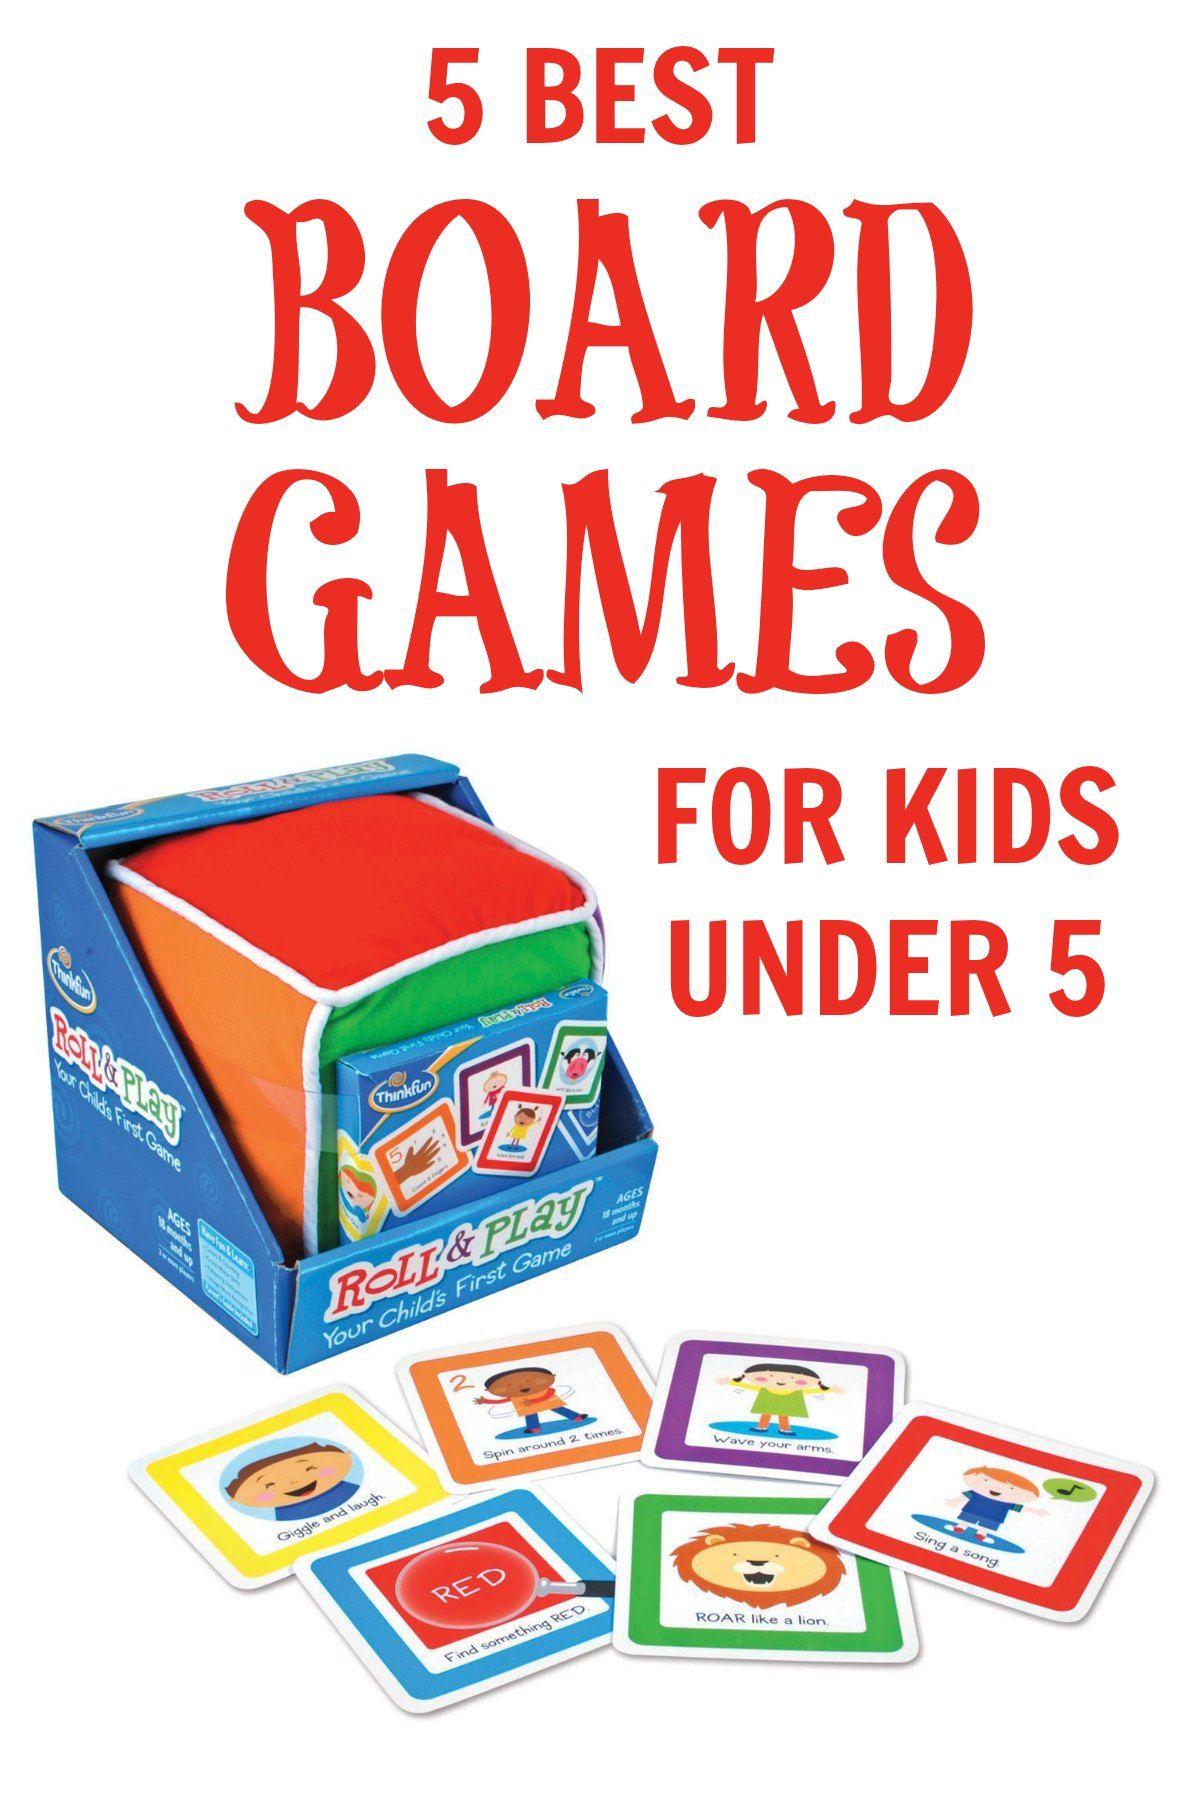 5 Best (tried & true!) Board Games for Kids Under 5